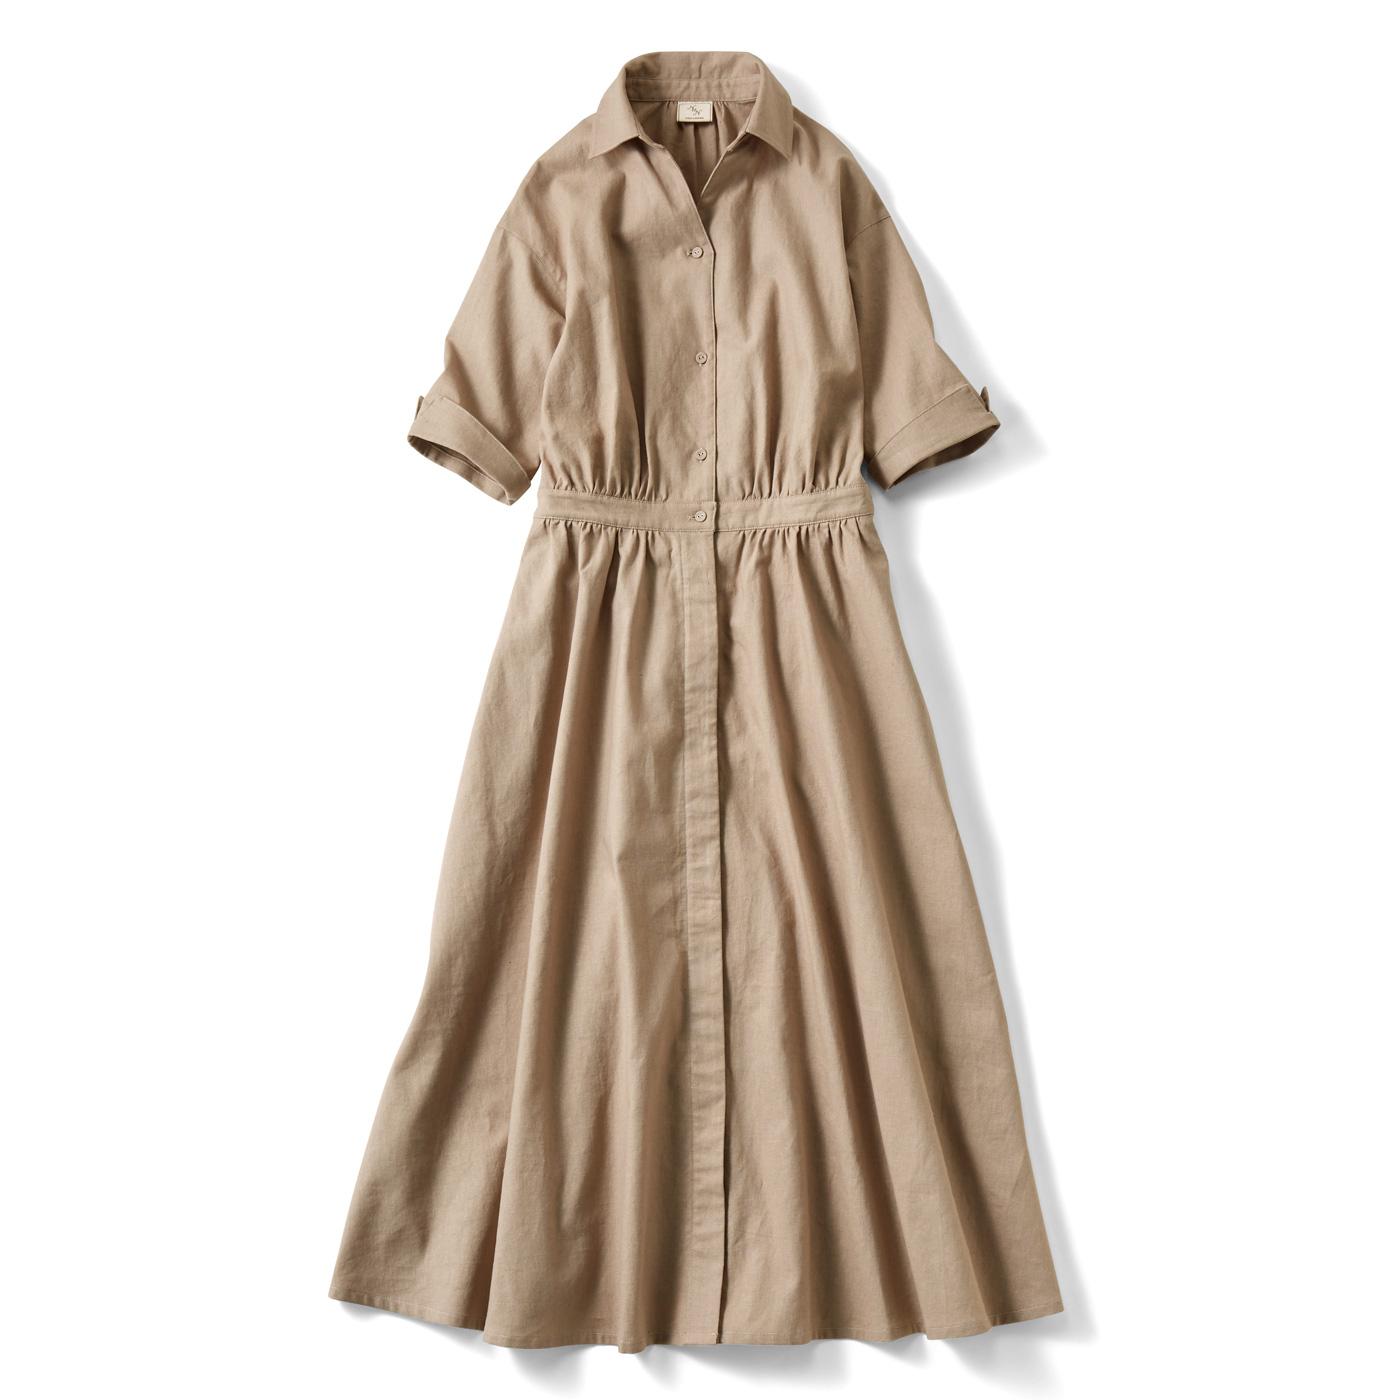 IEDIT[イディット] コットンリネンのオープンカラーシャツワンピース〈グレージュ〉